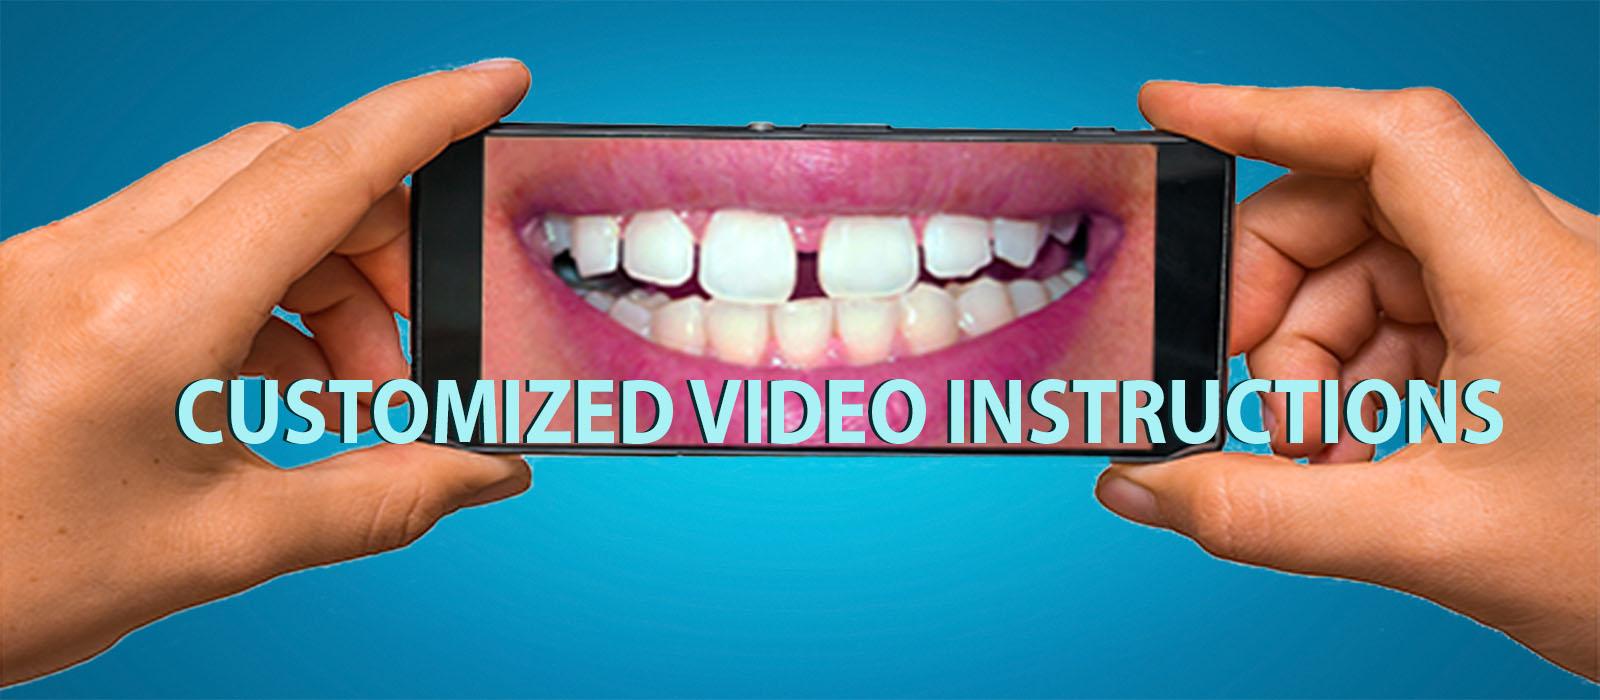 CUSTOM VIDEO INSTRUCTIONS